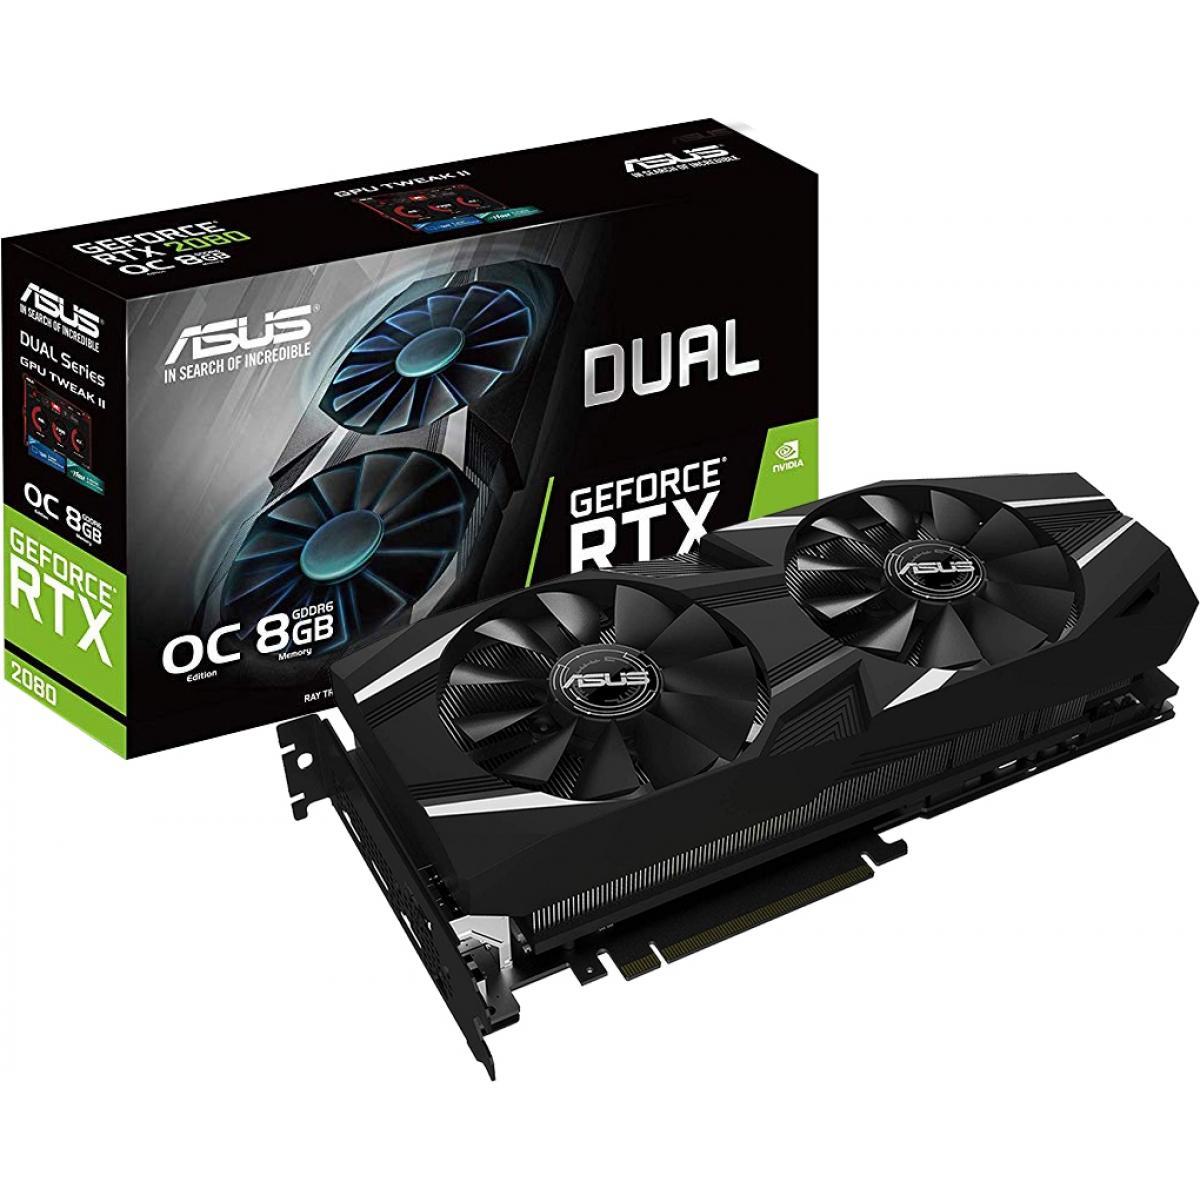 Placa de Vídeo Asus, Geforce, RTX 2080 OC, Dual, 8GB, GDDR6, 256Bit, DUAL-RTX2080-O8G